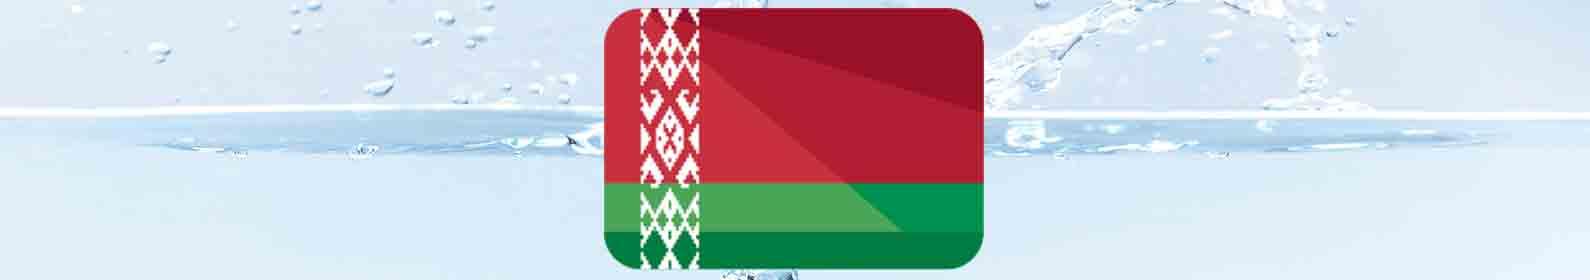 water-treatment-belarus.jpg